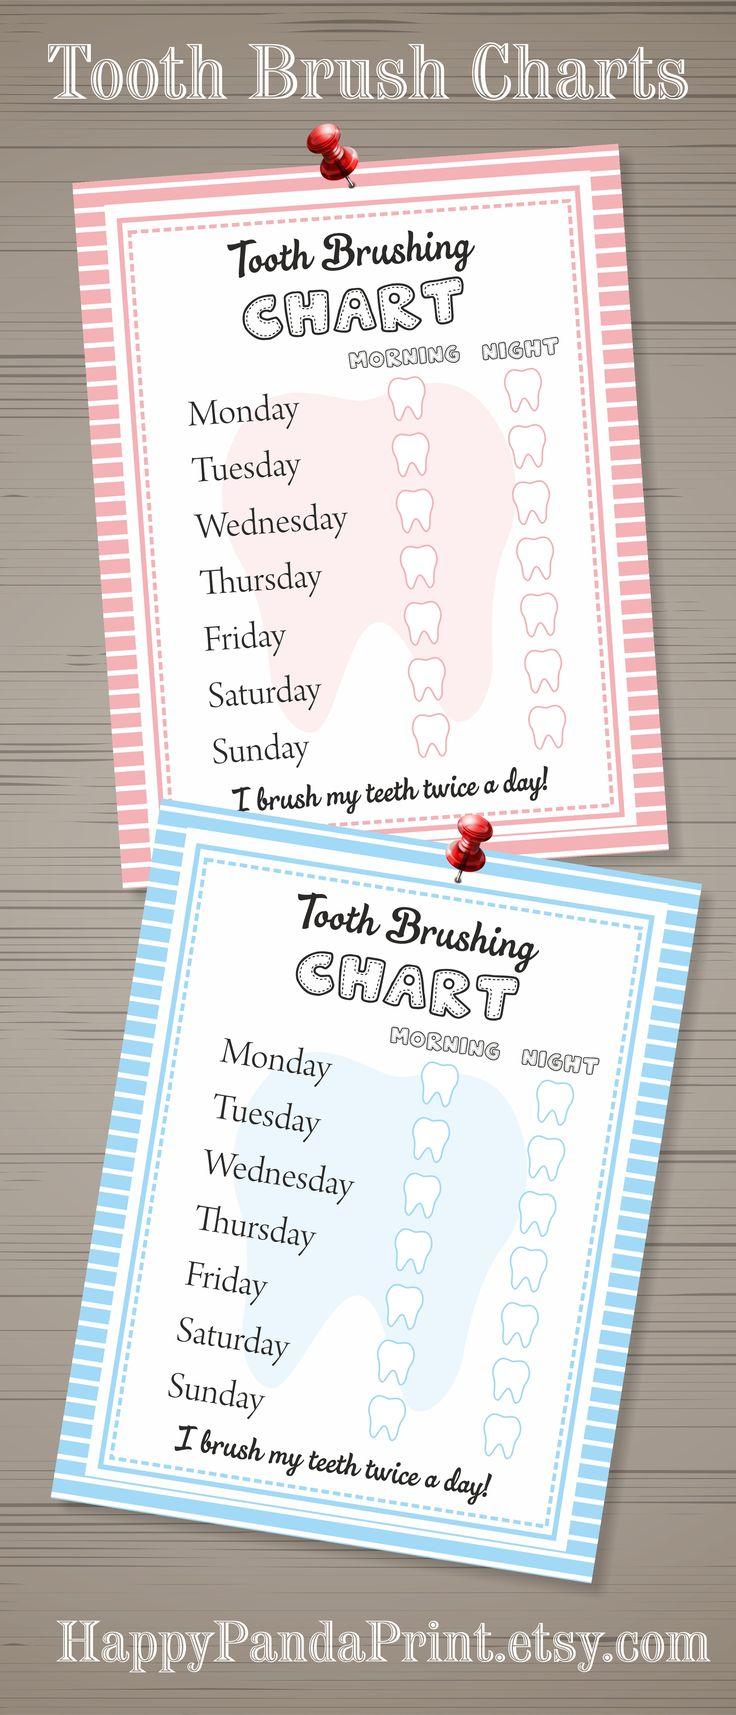 BOYS TOOTH BRUSH Chart, Boys Tooth Brushing Chore Chart, Child Tooth Brush Chore Chart, Toddler Tooth Brush Chart, Brush Your Teeth Printable,  GIRLS TOOTH BRUSH Chart, Girls Tooth Brushing Chore Chart